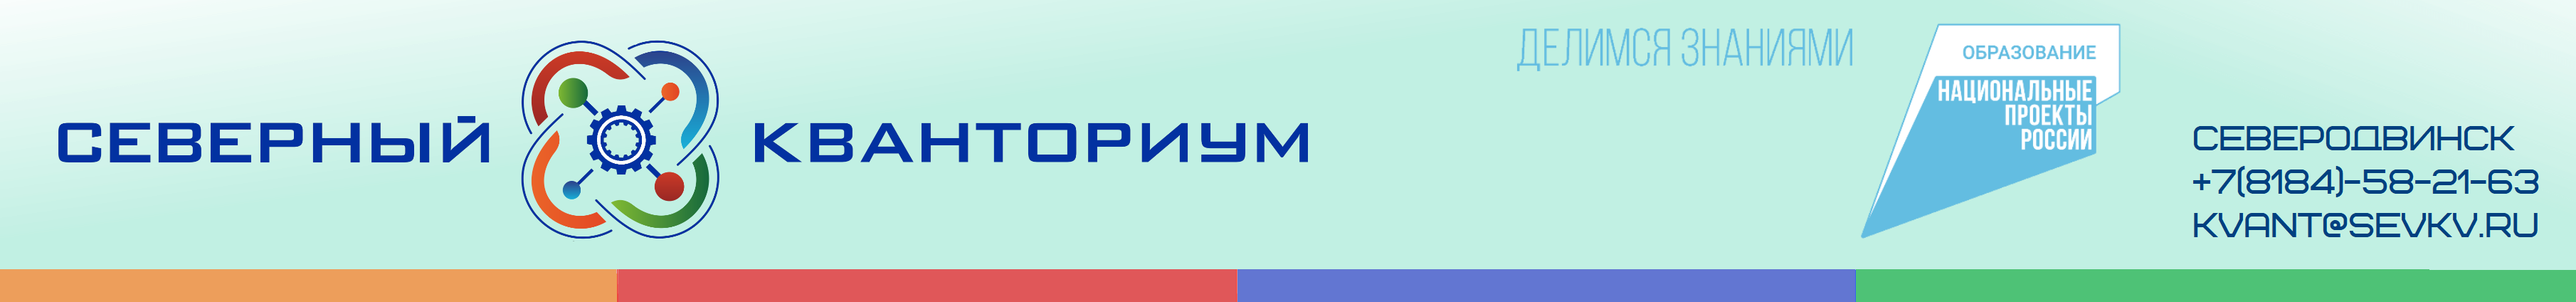 "МБОУДО ""ЦЮНТТ"", г. Северодвинск"